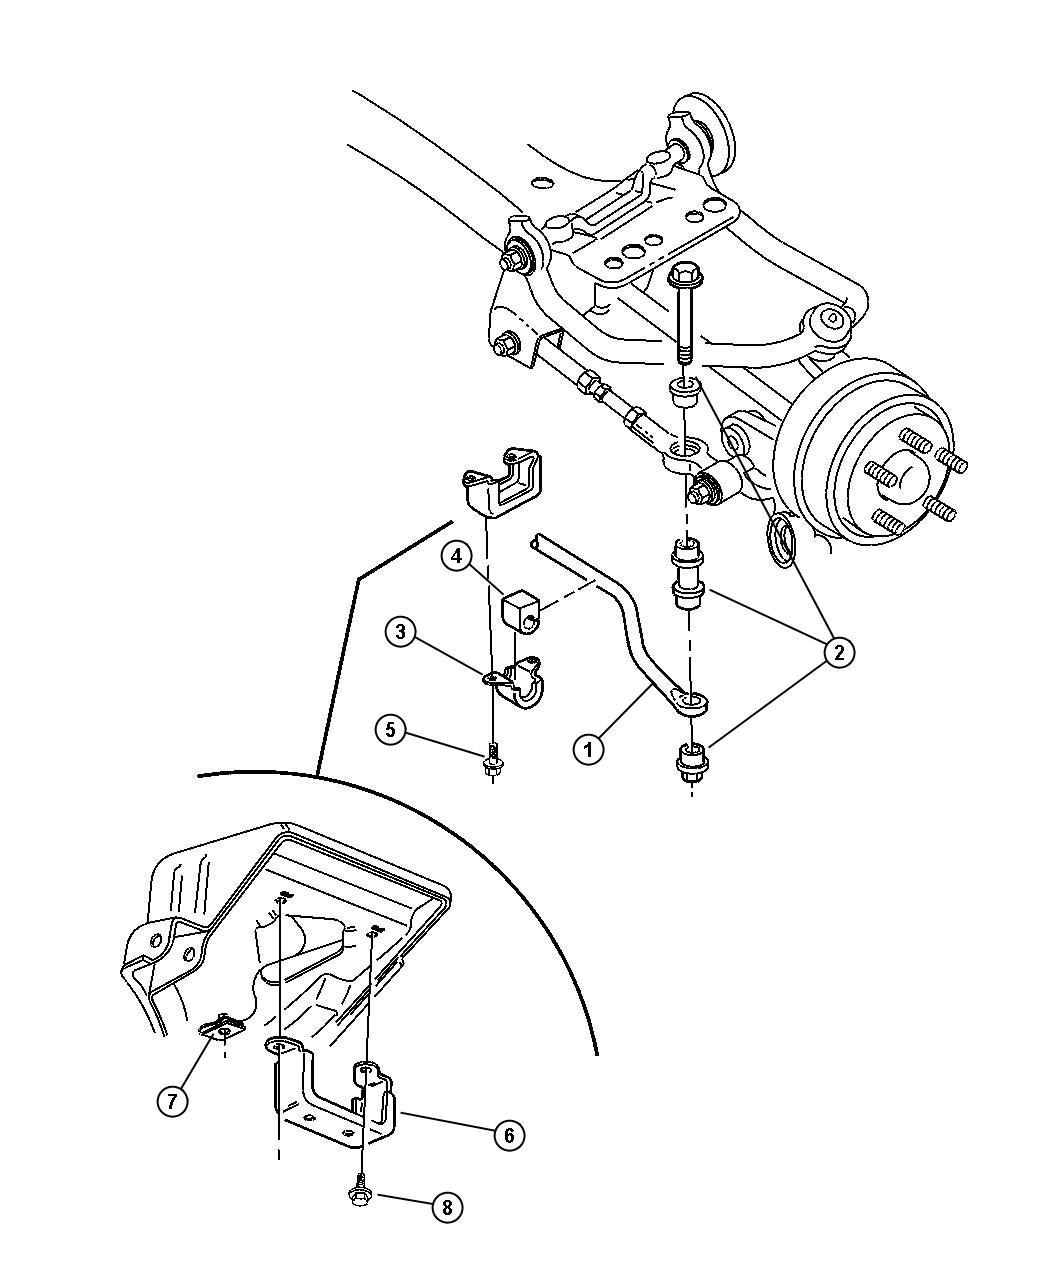 Dodge Stratus Sway Bar Rear